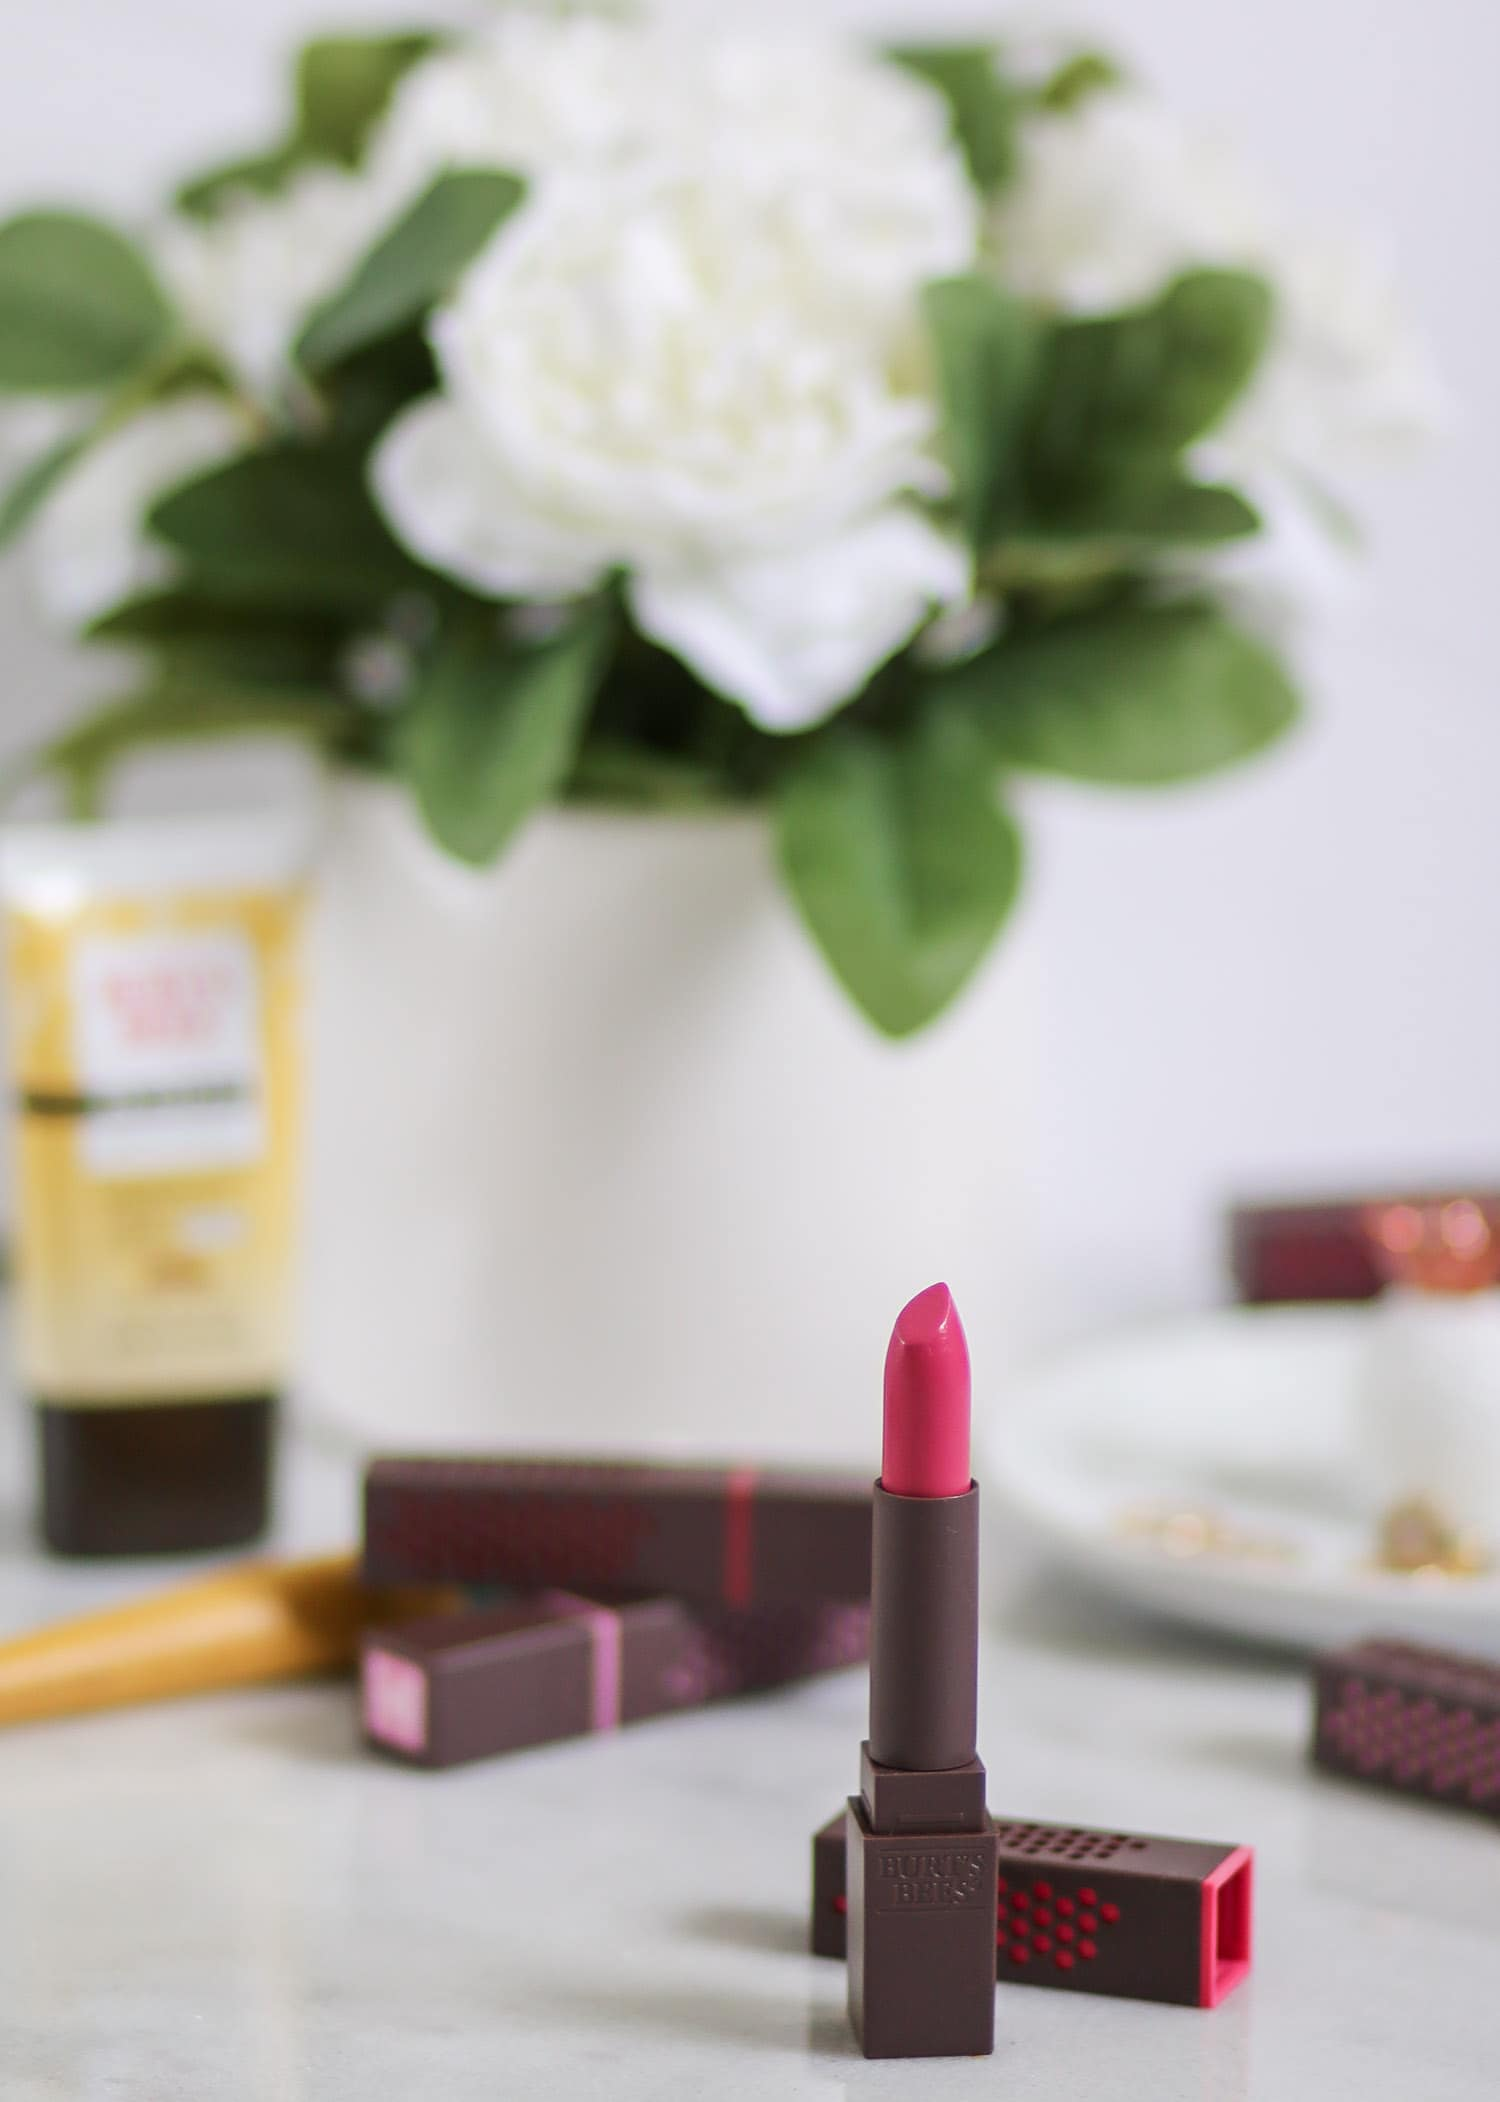 burts-bee-lipsticks-swatches-2119